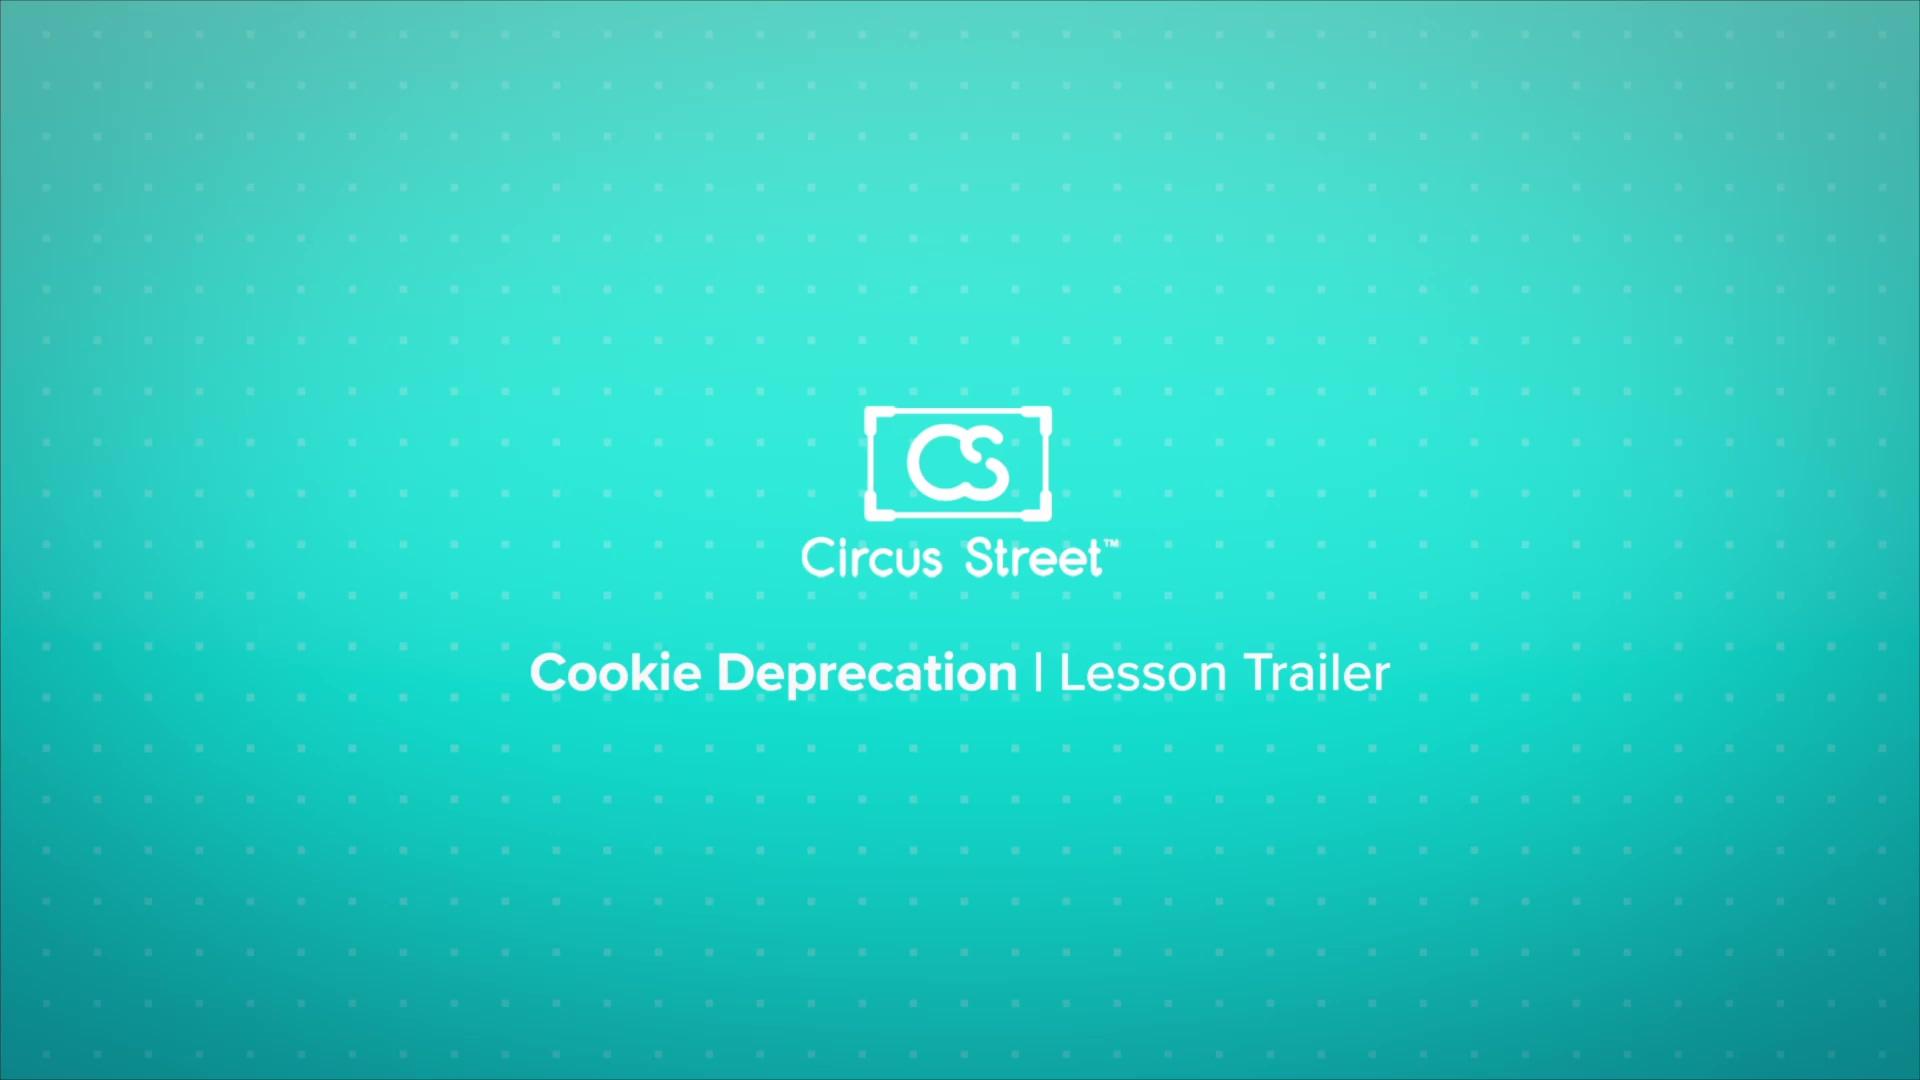 Cookie Deprecation Trailer